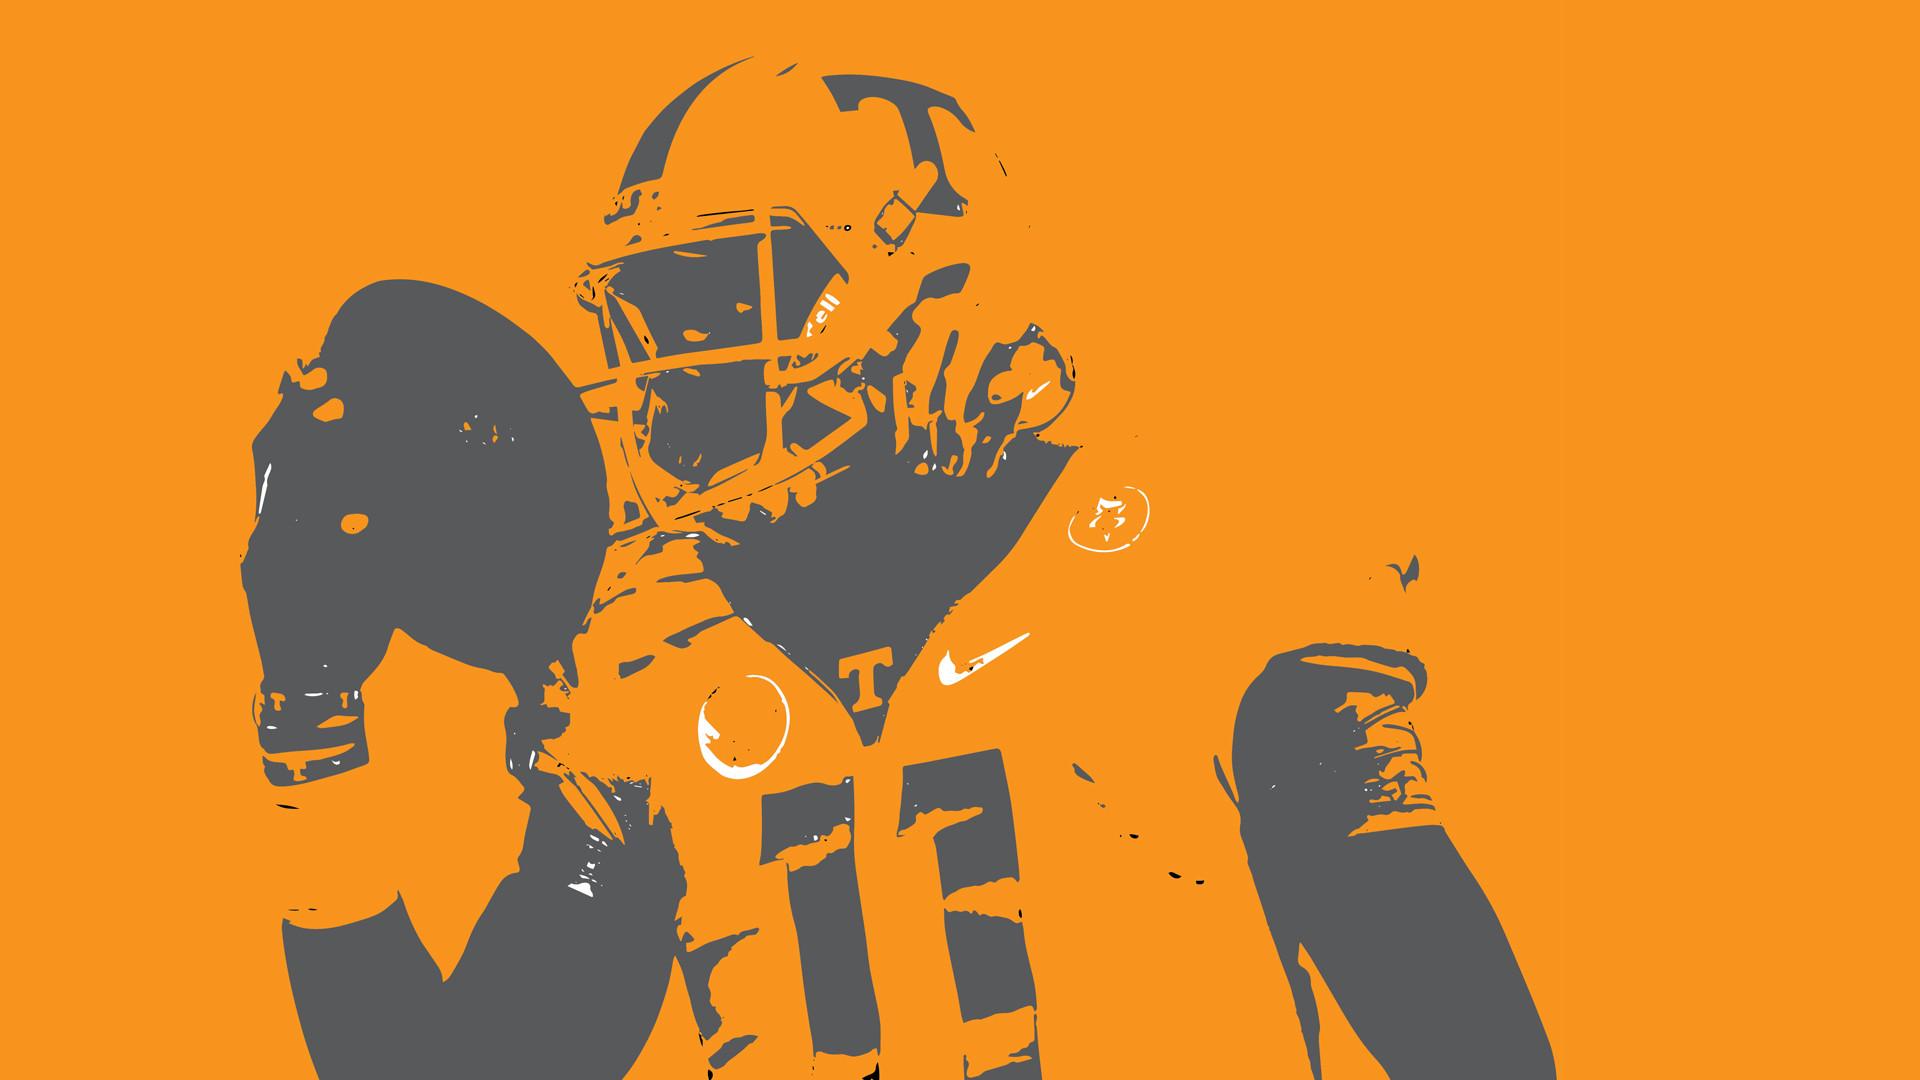 Tennessee Ut Football Wallpaper (66+ images)